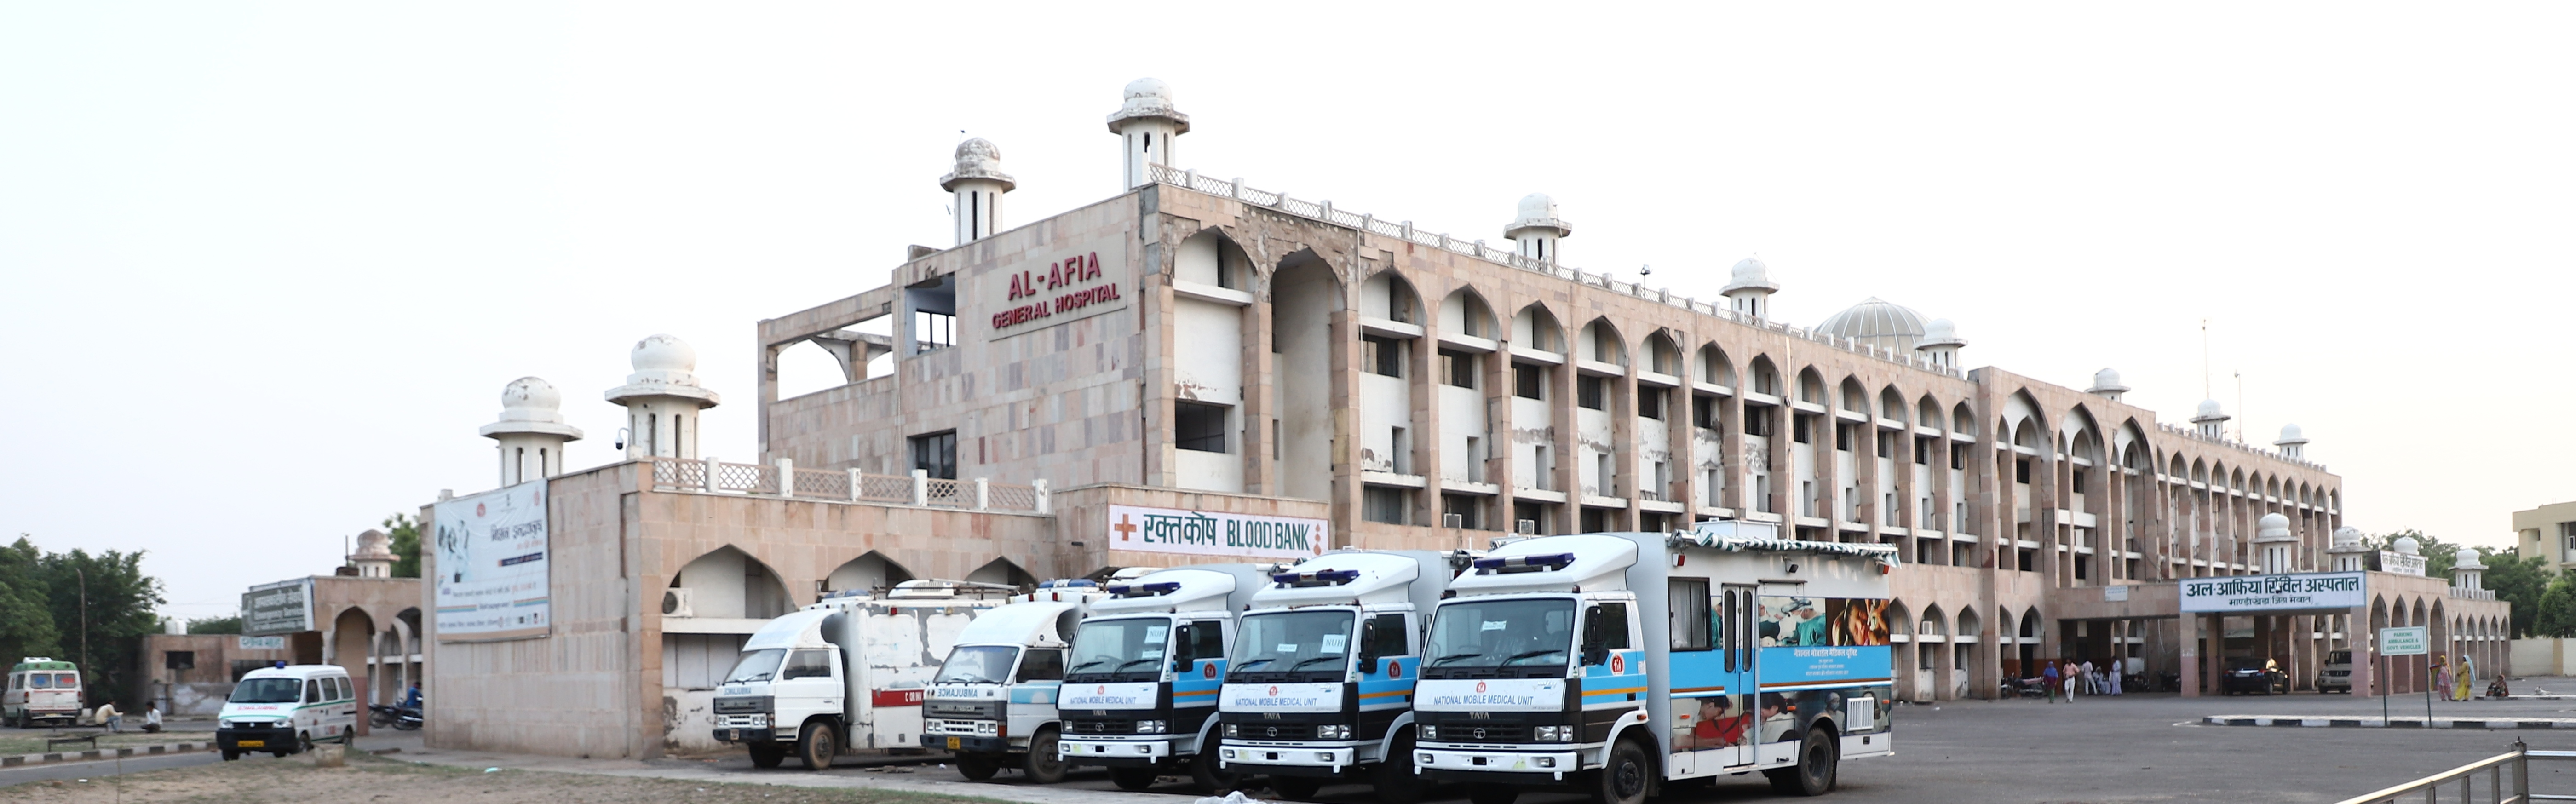 अल-अफिया जनरल अस्पताल, माडीखेड़ा|